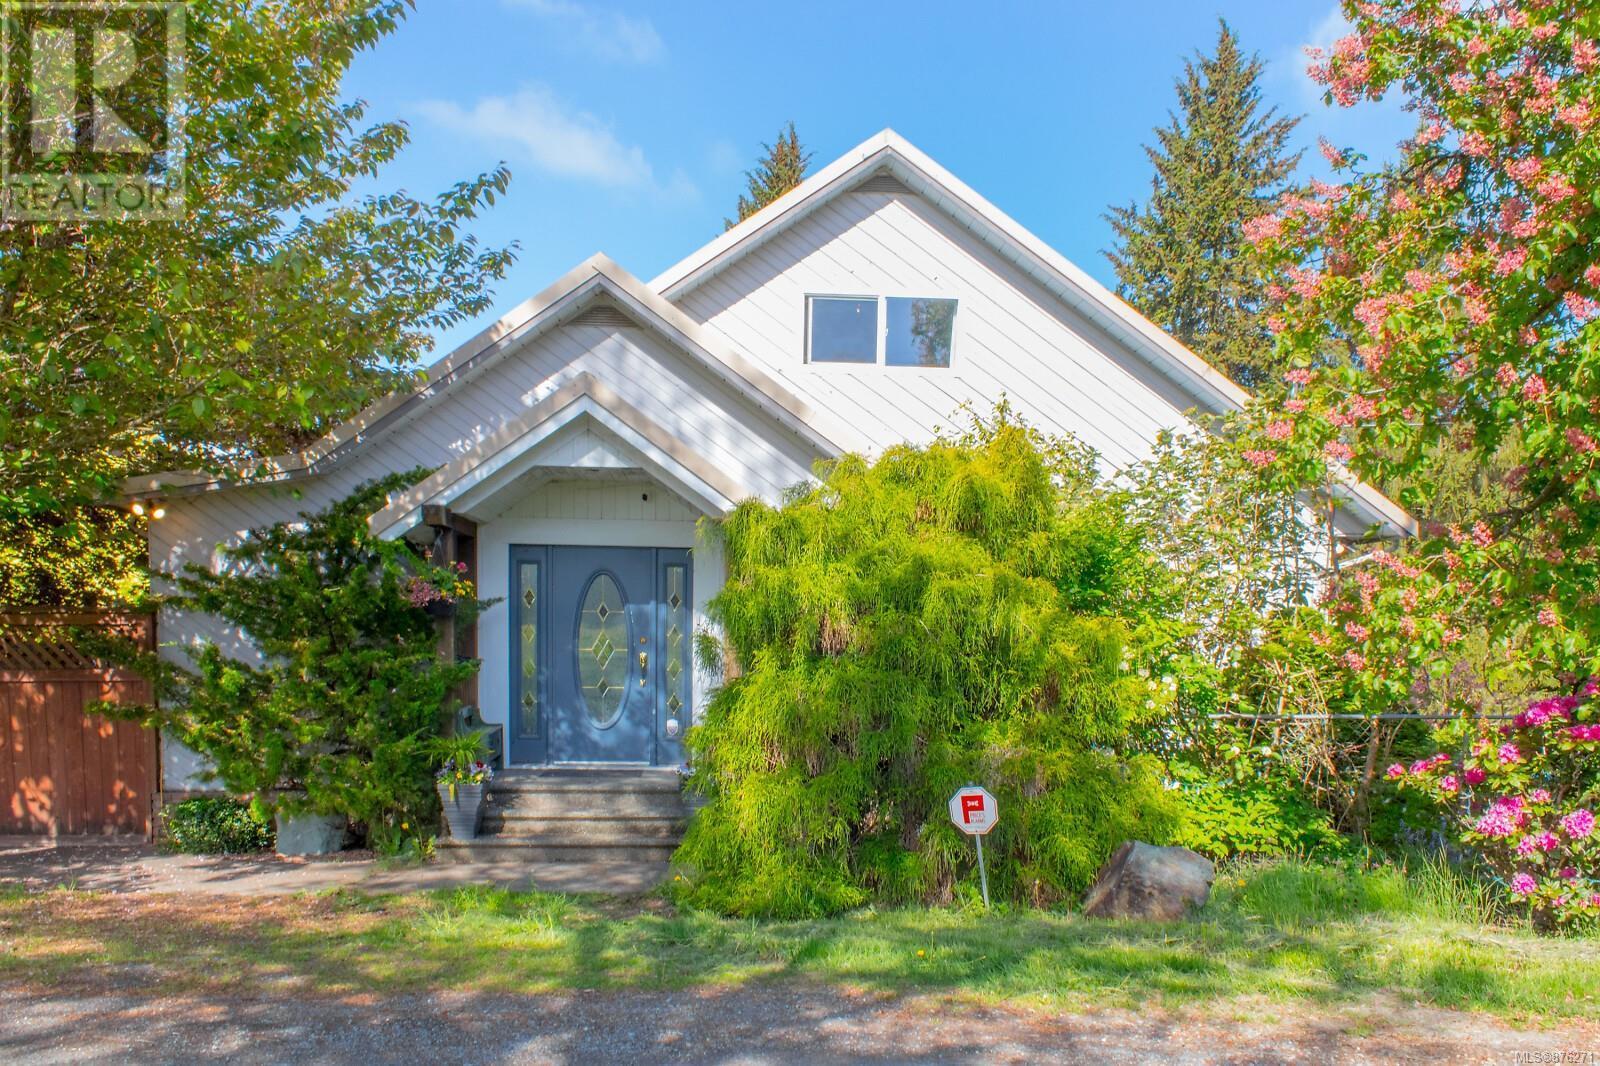 1854 Myhrest RdCobble Hill, British Columbia  V0R 1N1 - Photo 12 - 876271